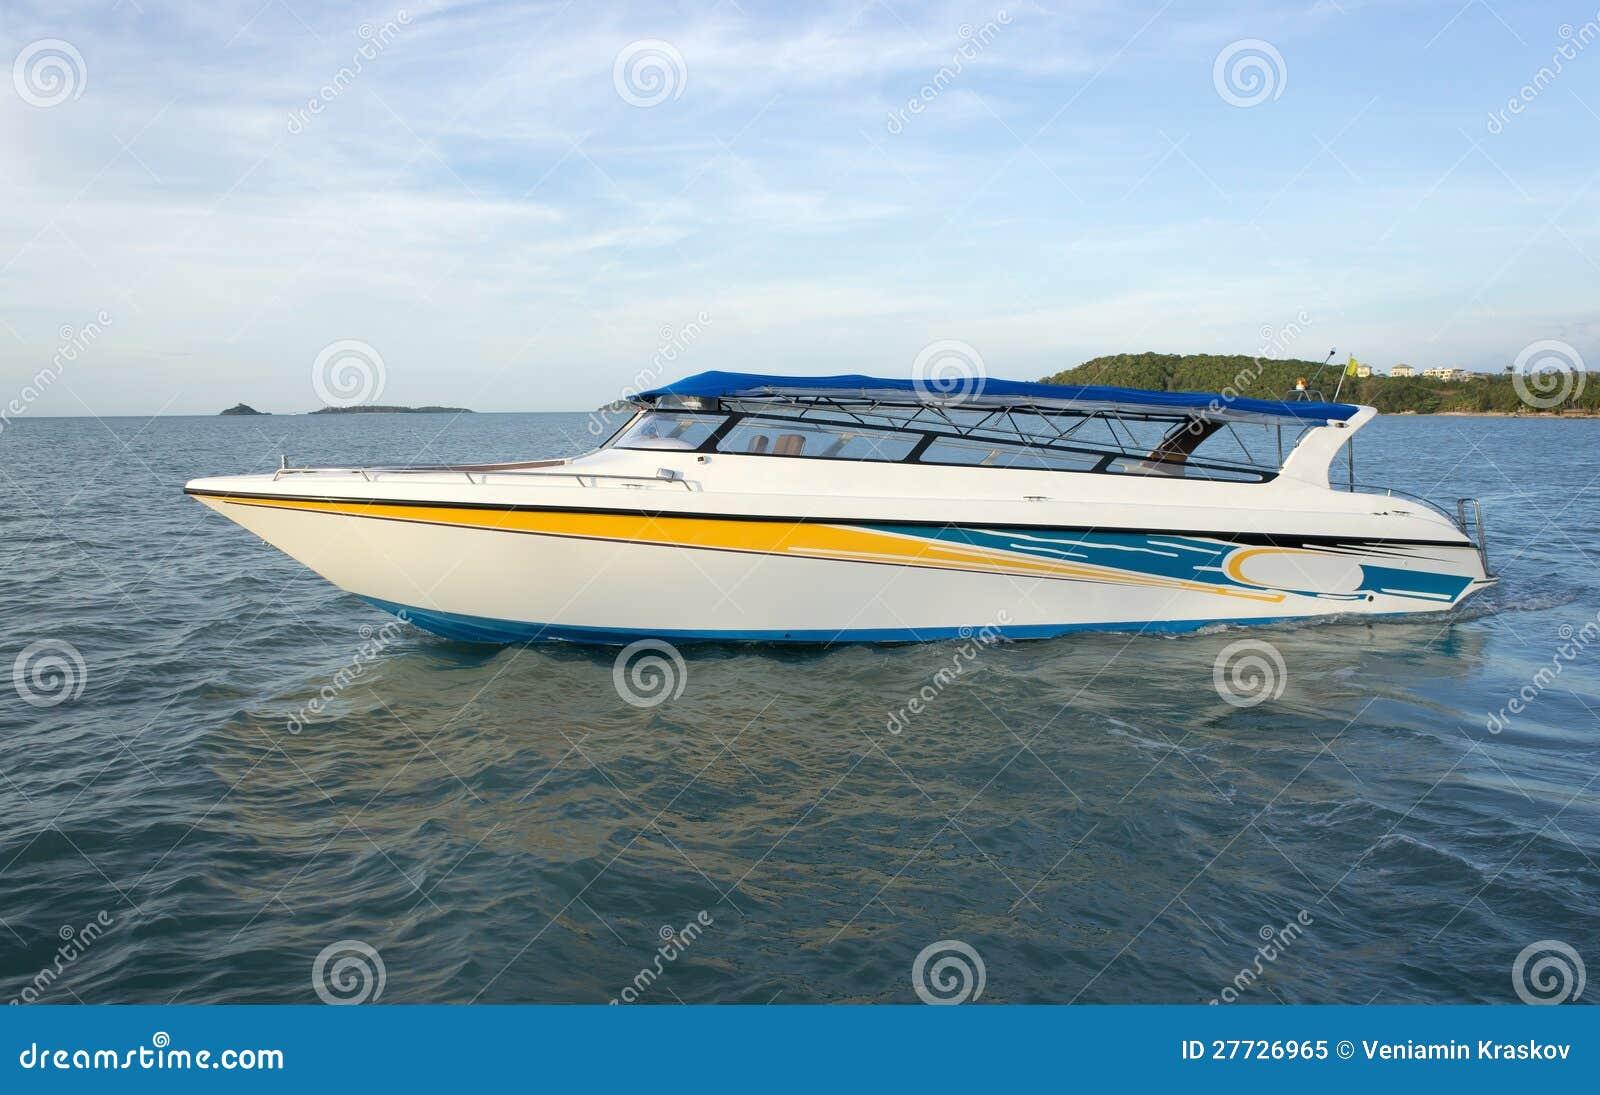 Drehzahlboot